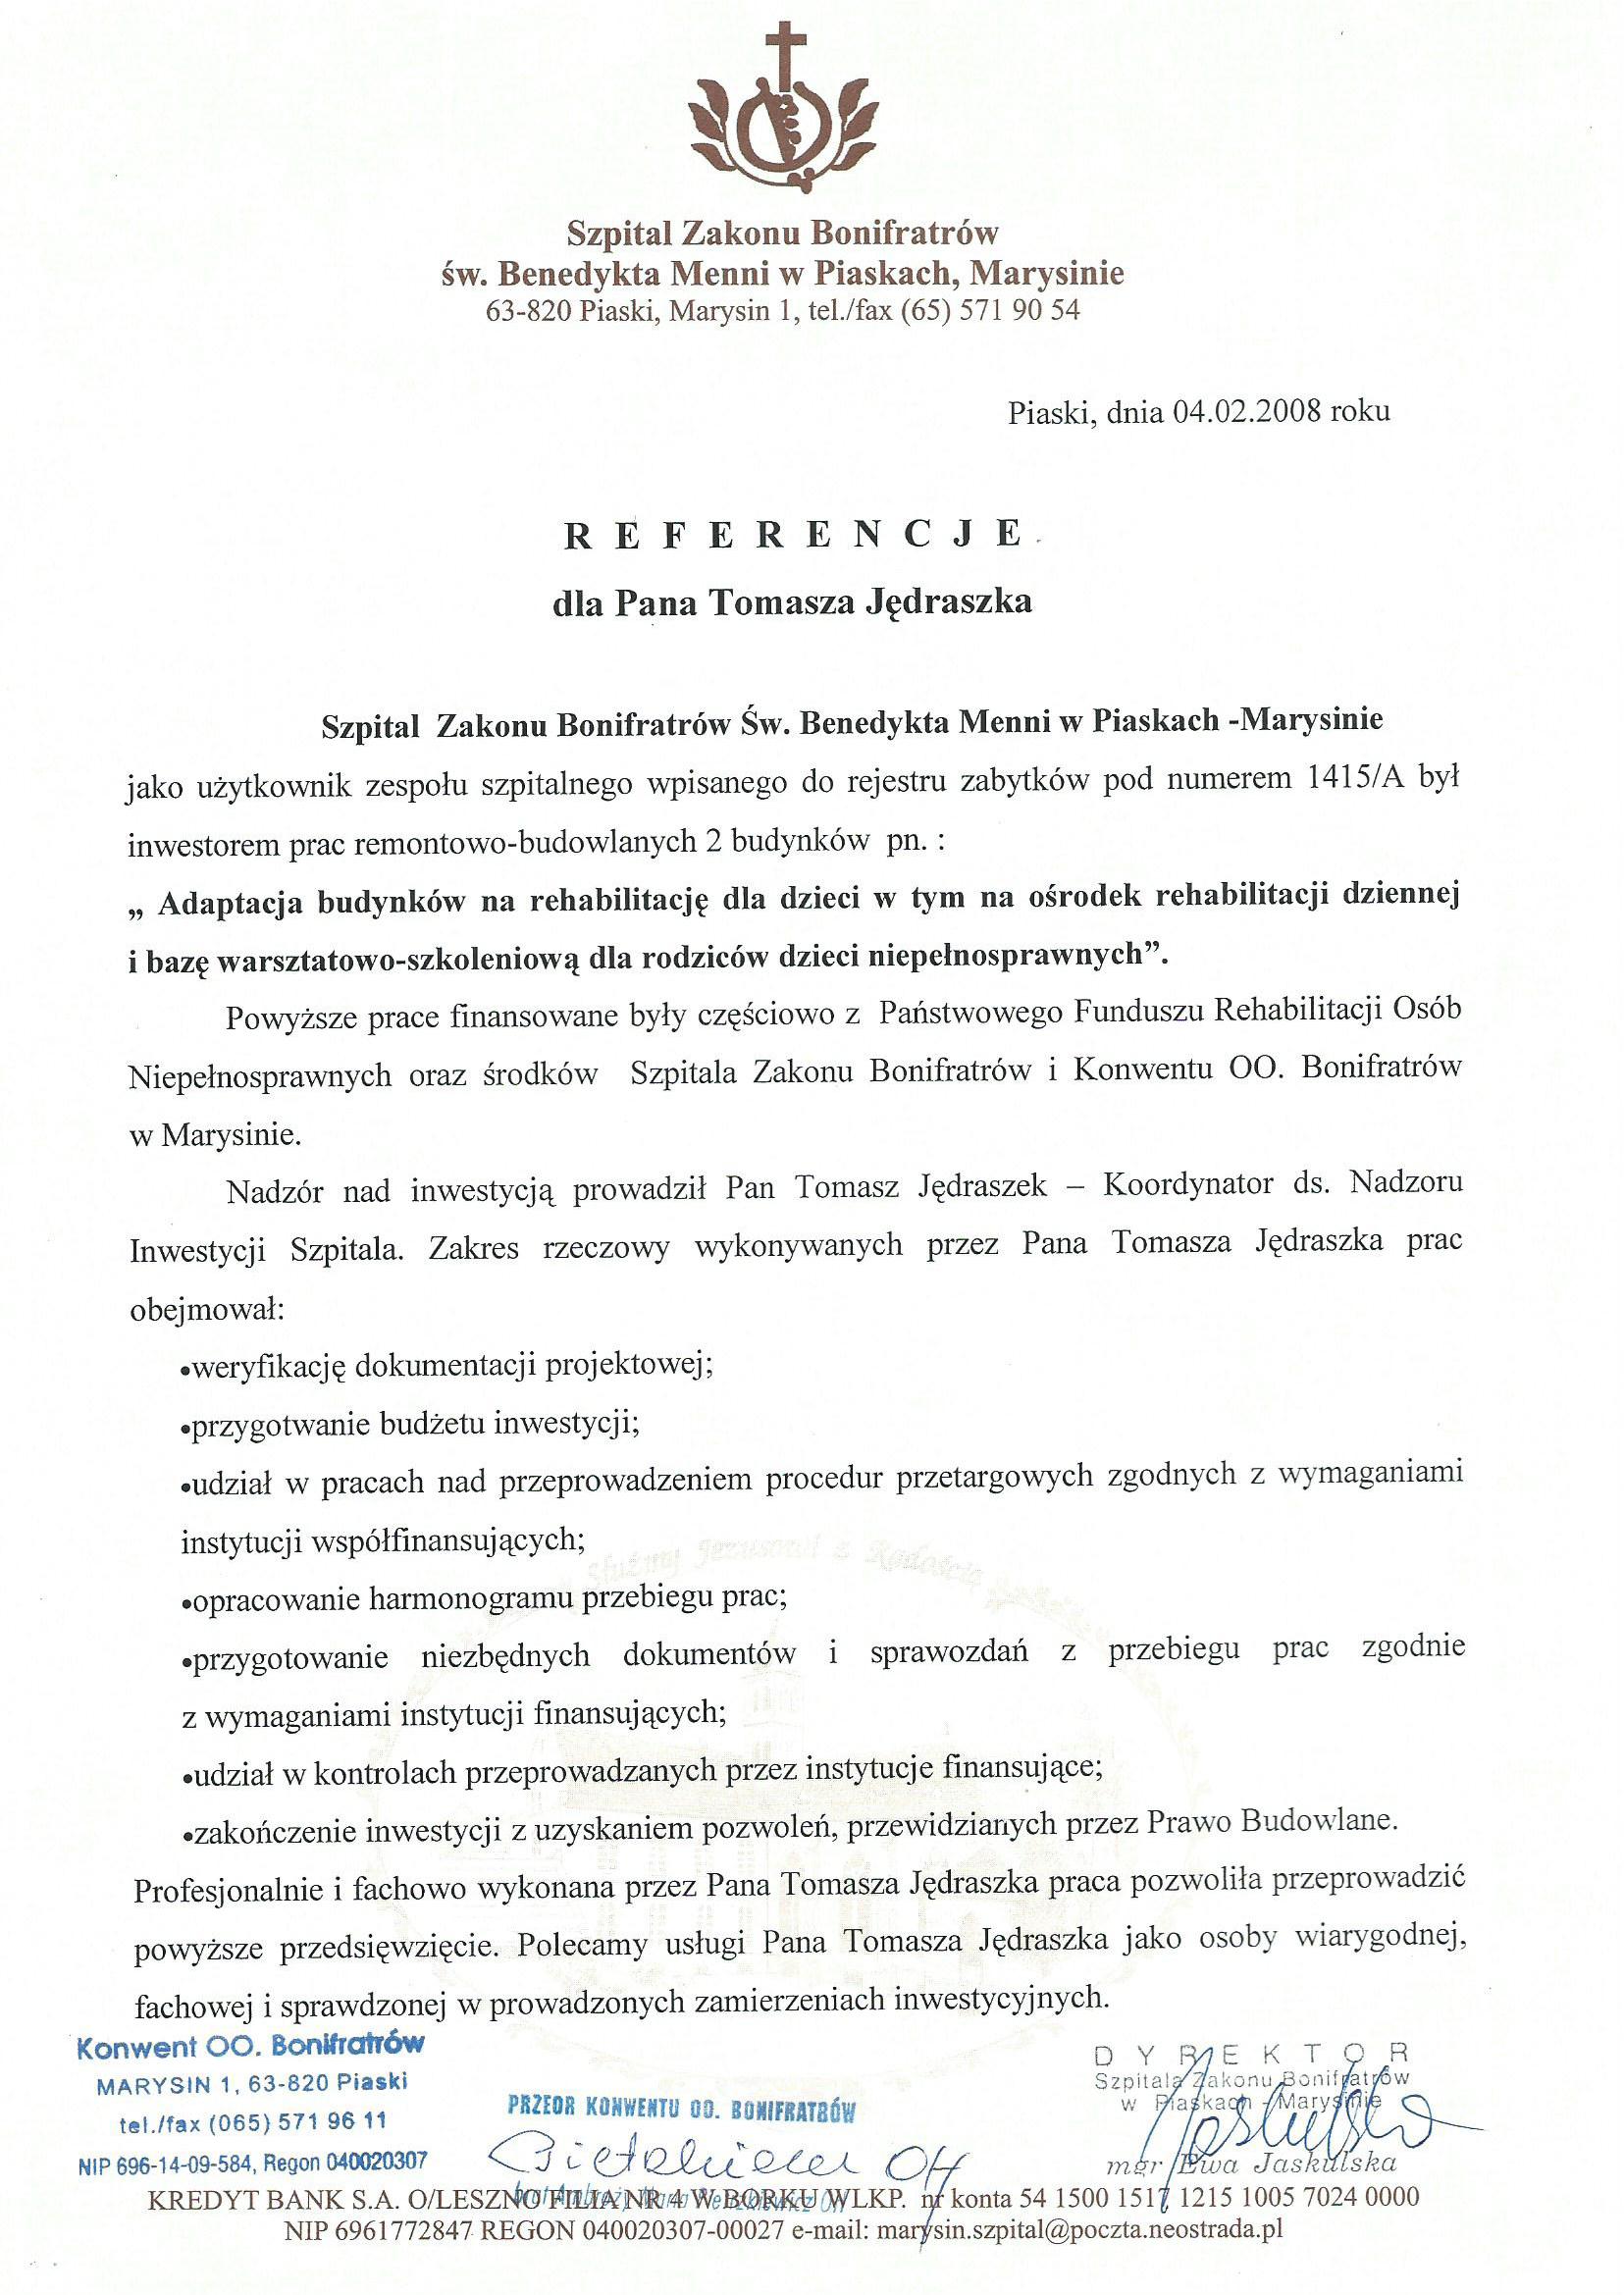 3_SZPITAL_ZAKONU_BONIFRATRoW_w_PIASKACH_tj-1